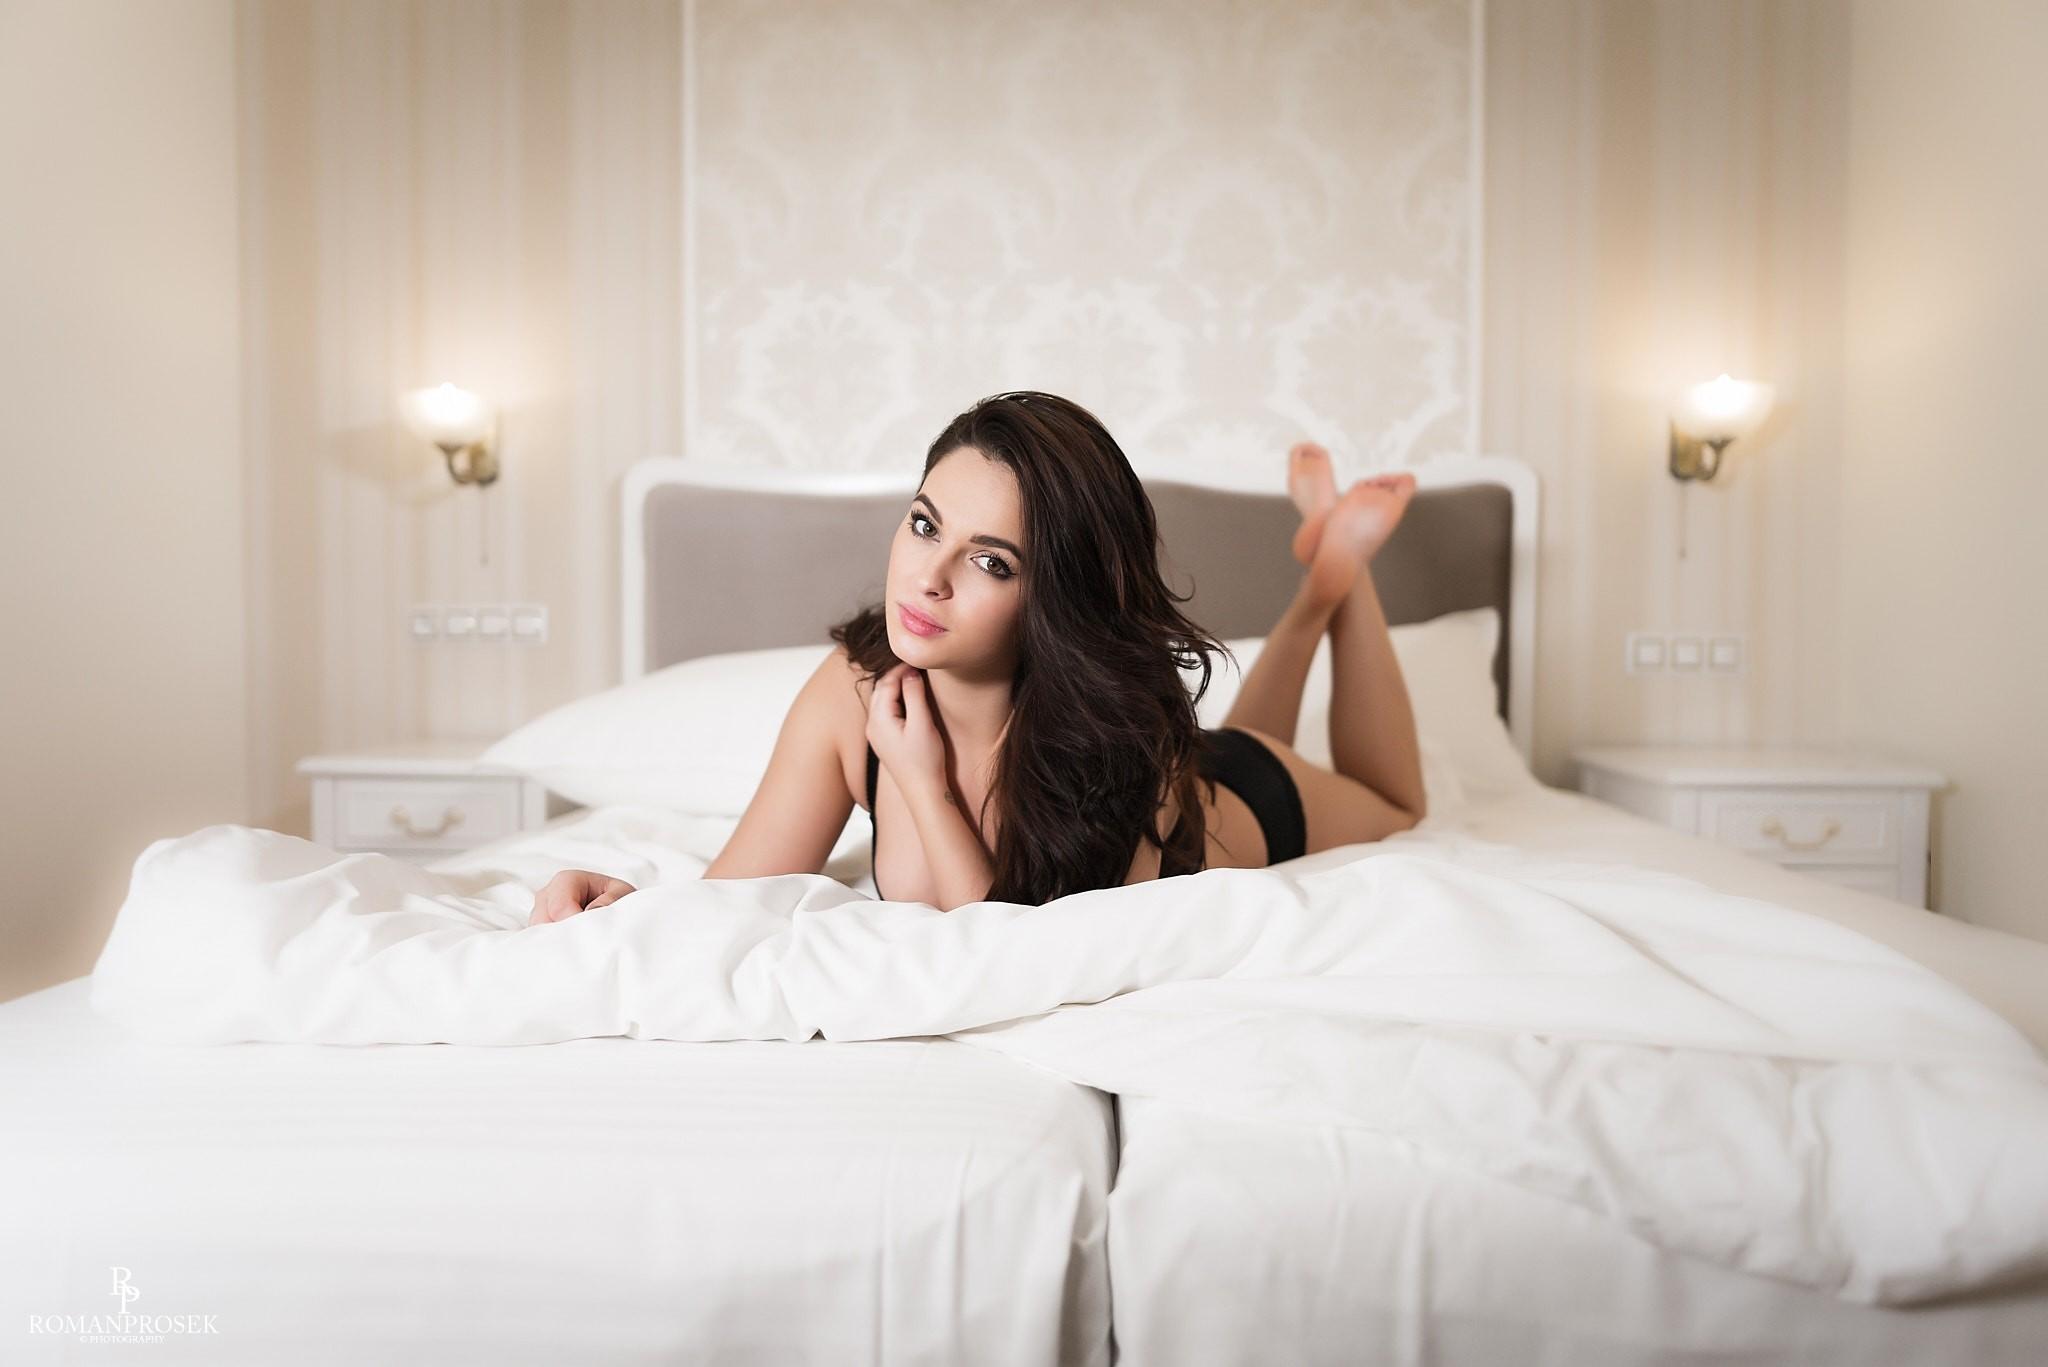 Try on haul porn pics